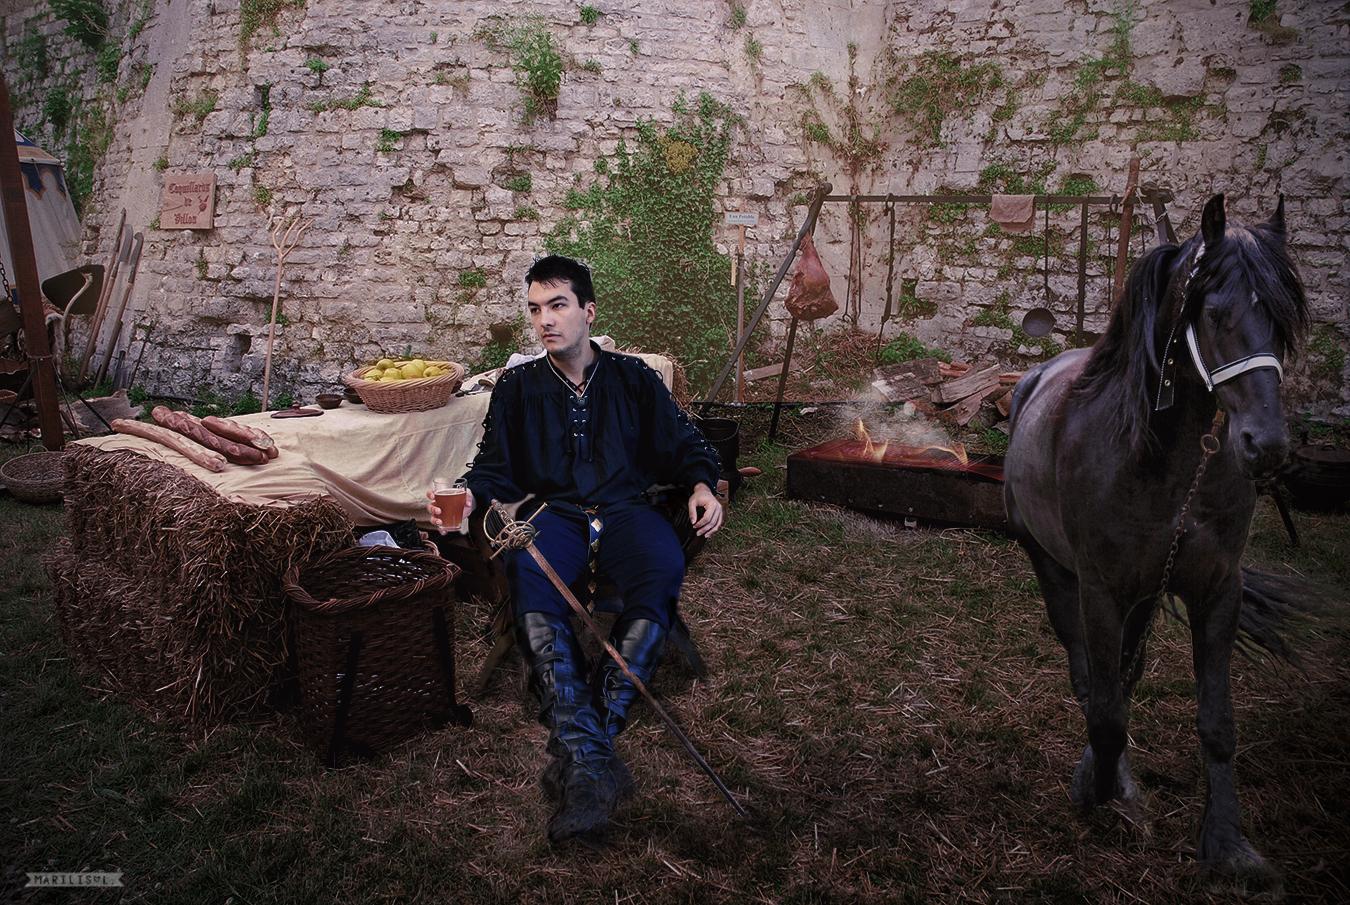 Medieval Camp by Marilis5604